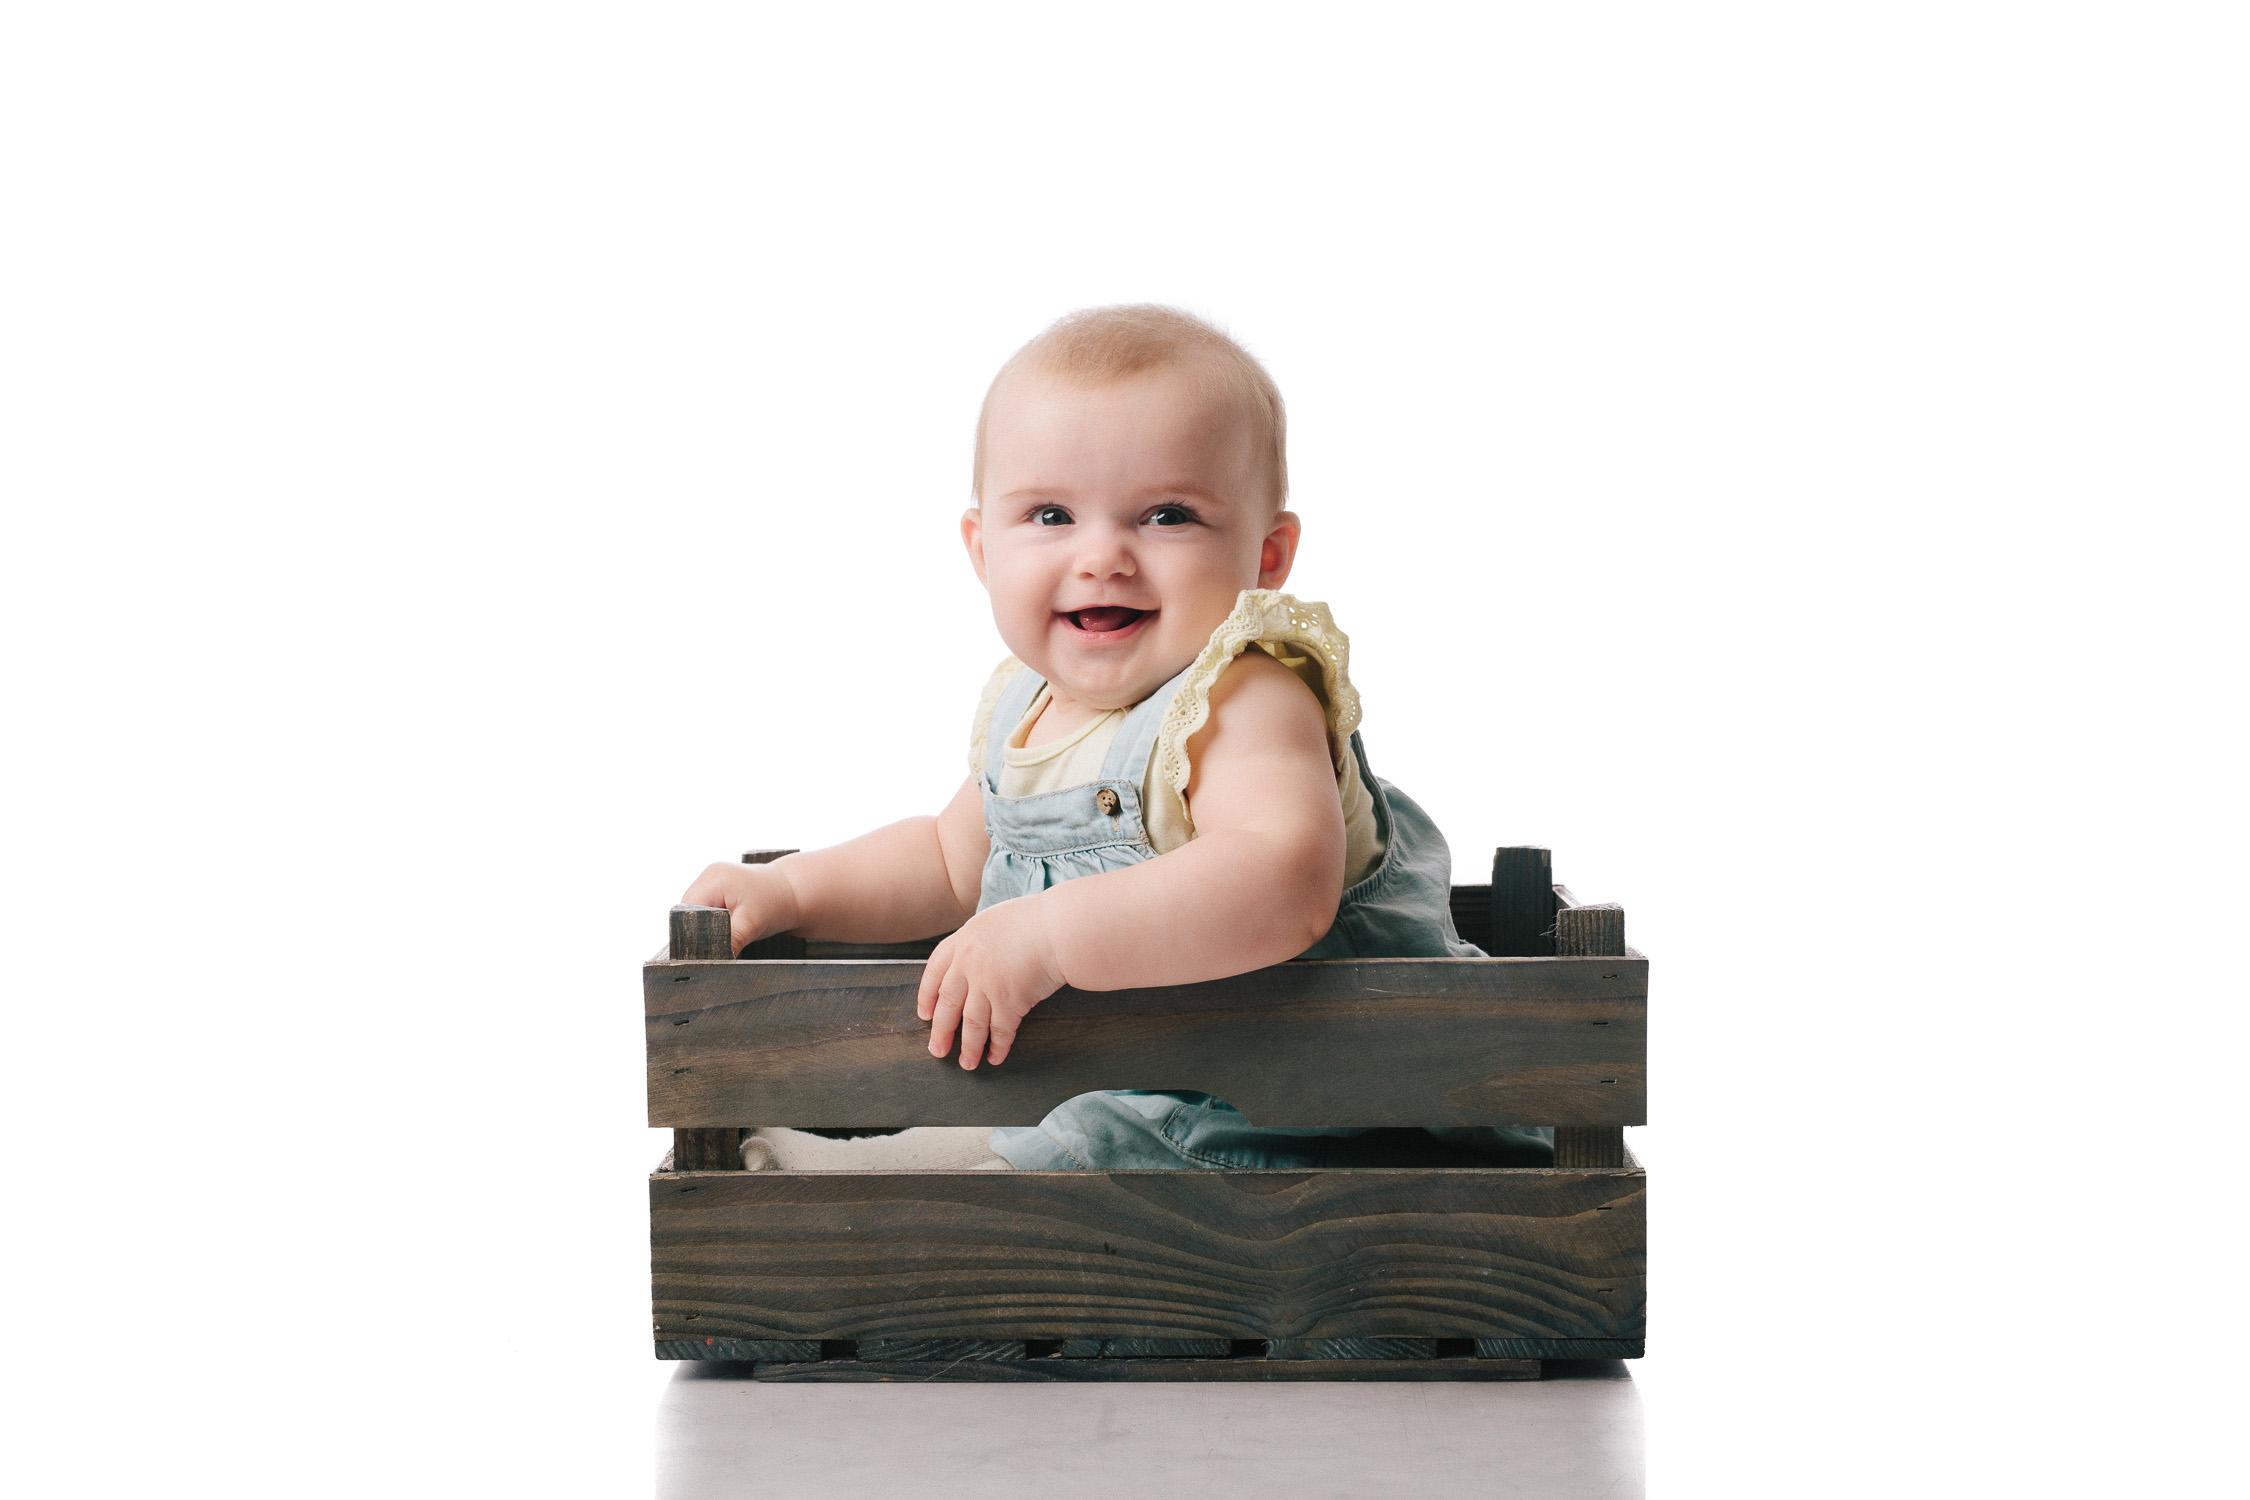 baby-babyfotograf-babyfotografering-fotograf-hodnedesign-pål-hodne--25.jpg